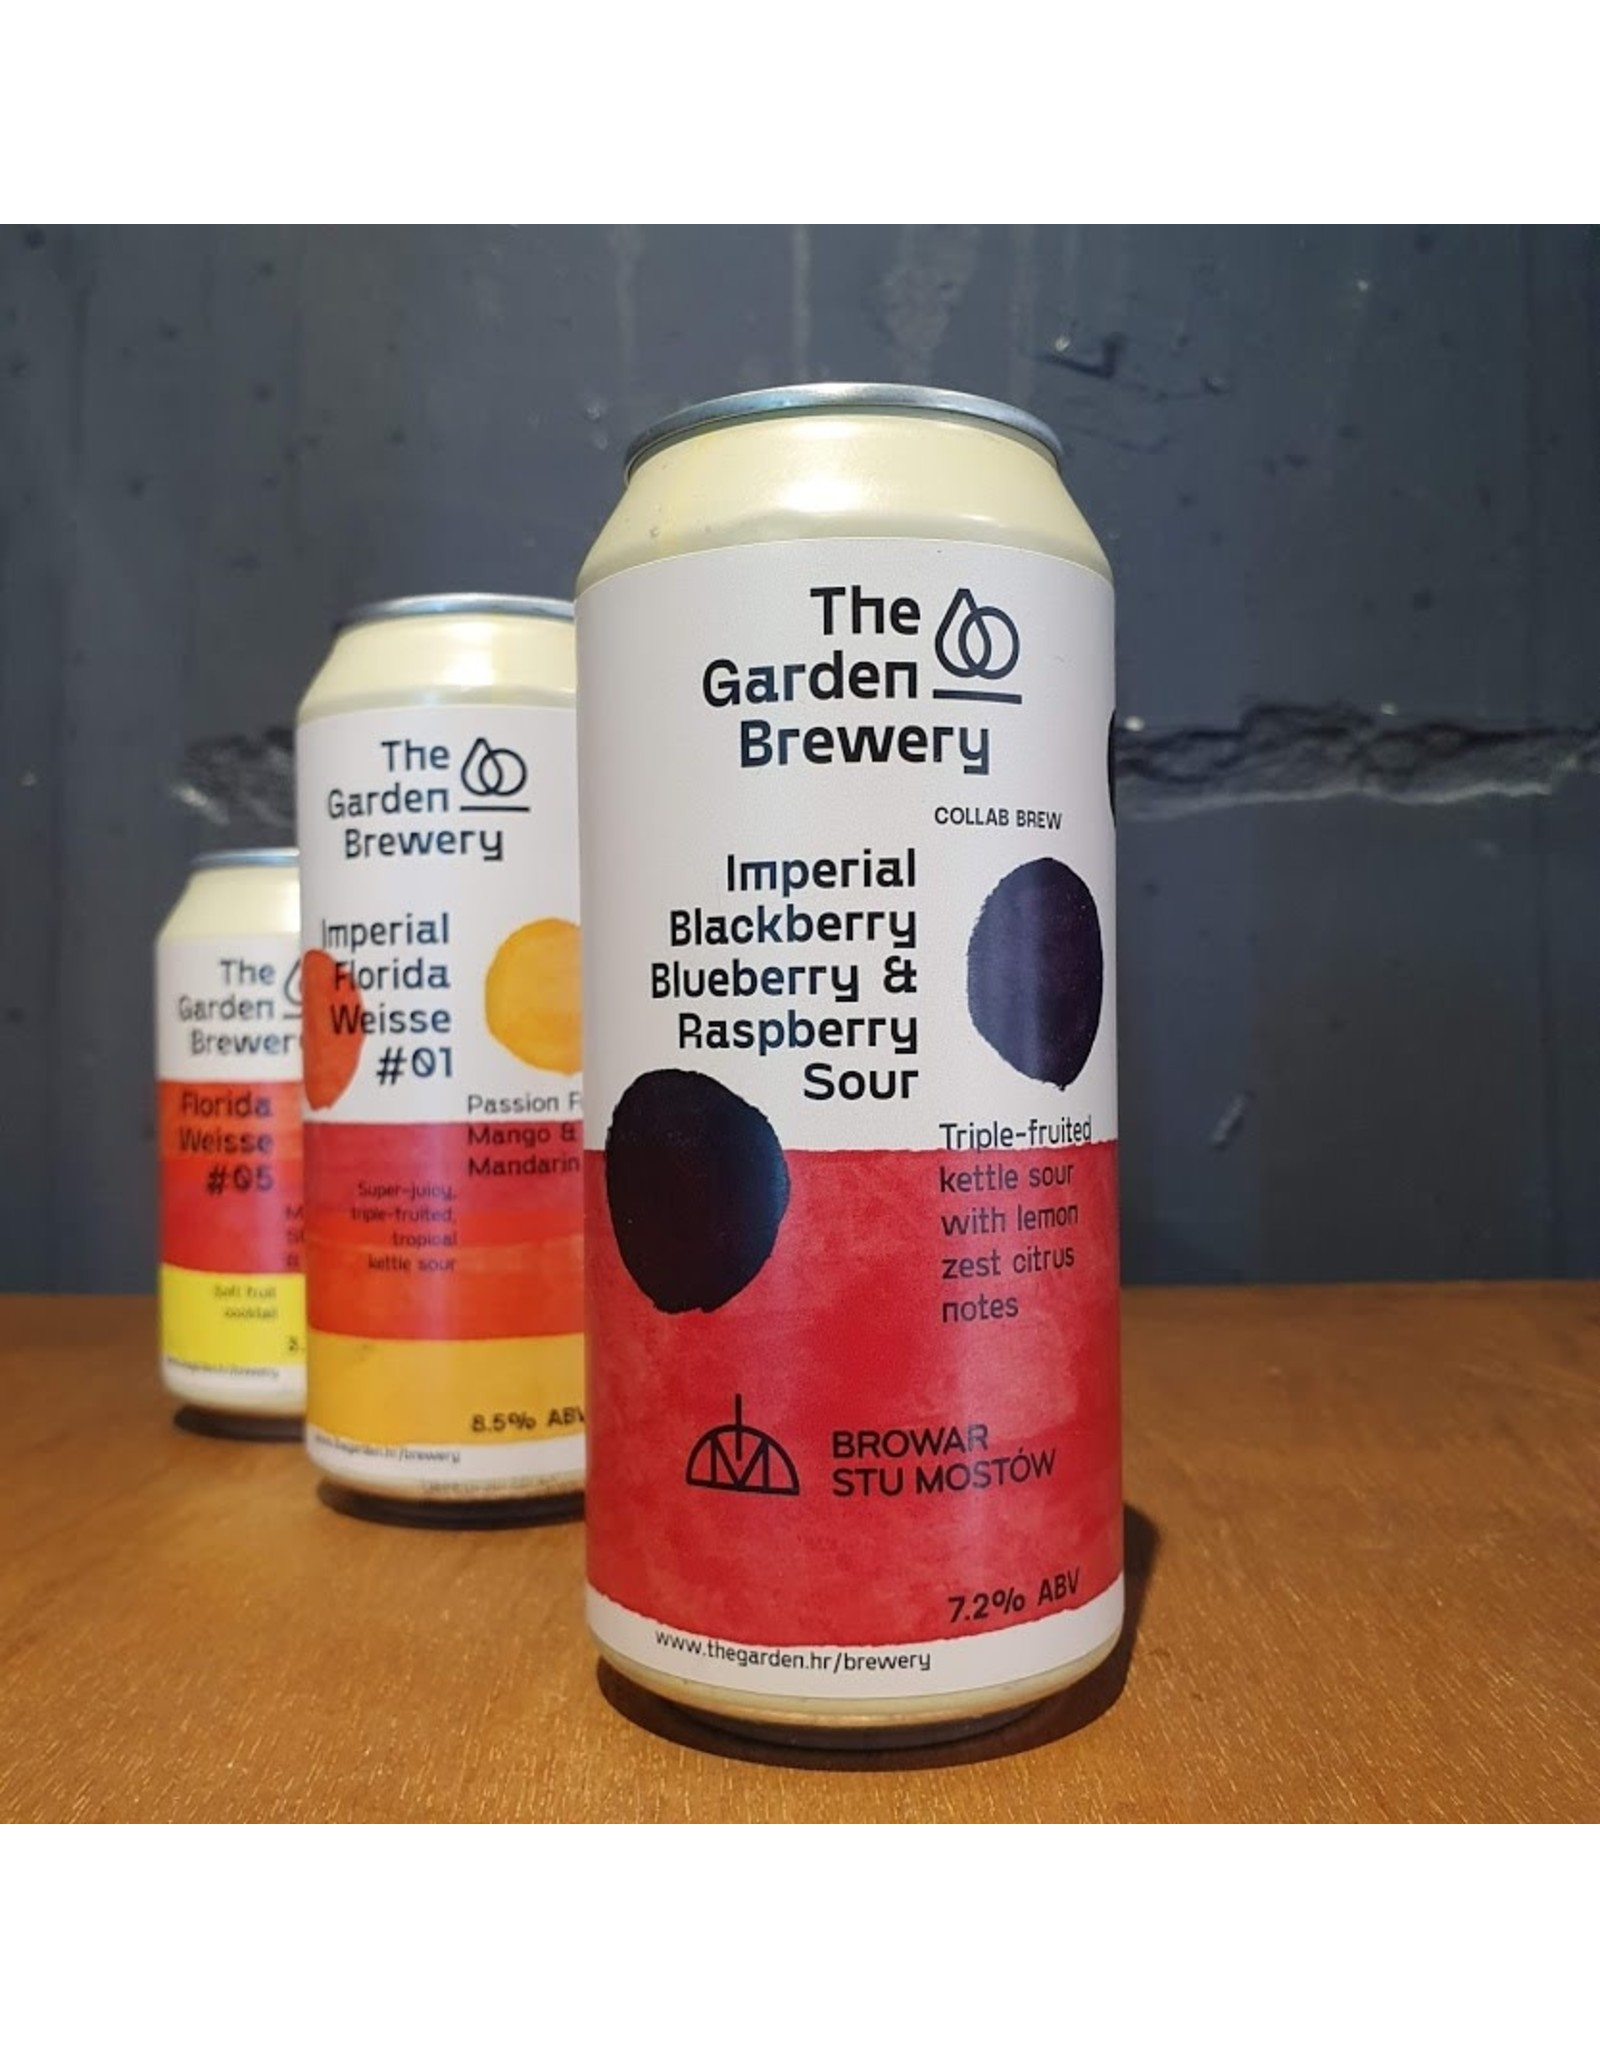 The Garden Brewery The garden brewery - imperial Blackberry, Blueberry & Raspberry Sour